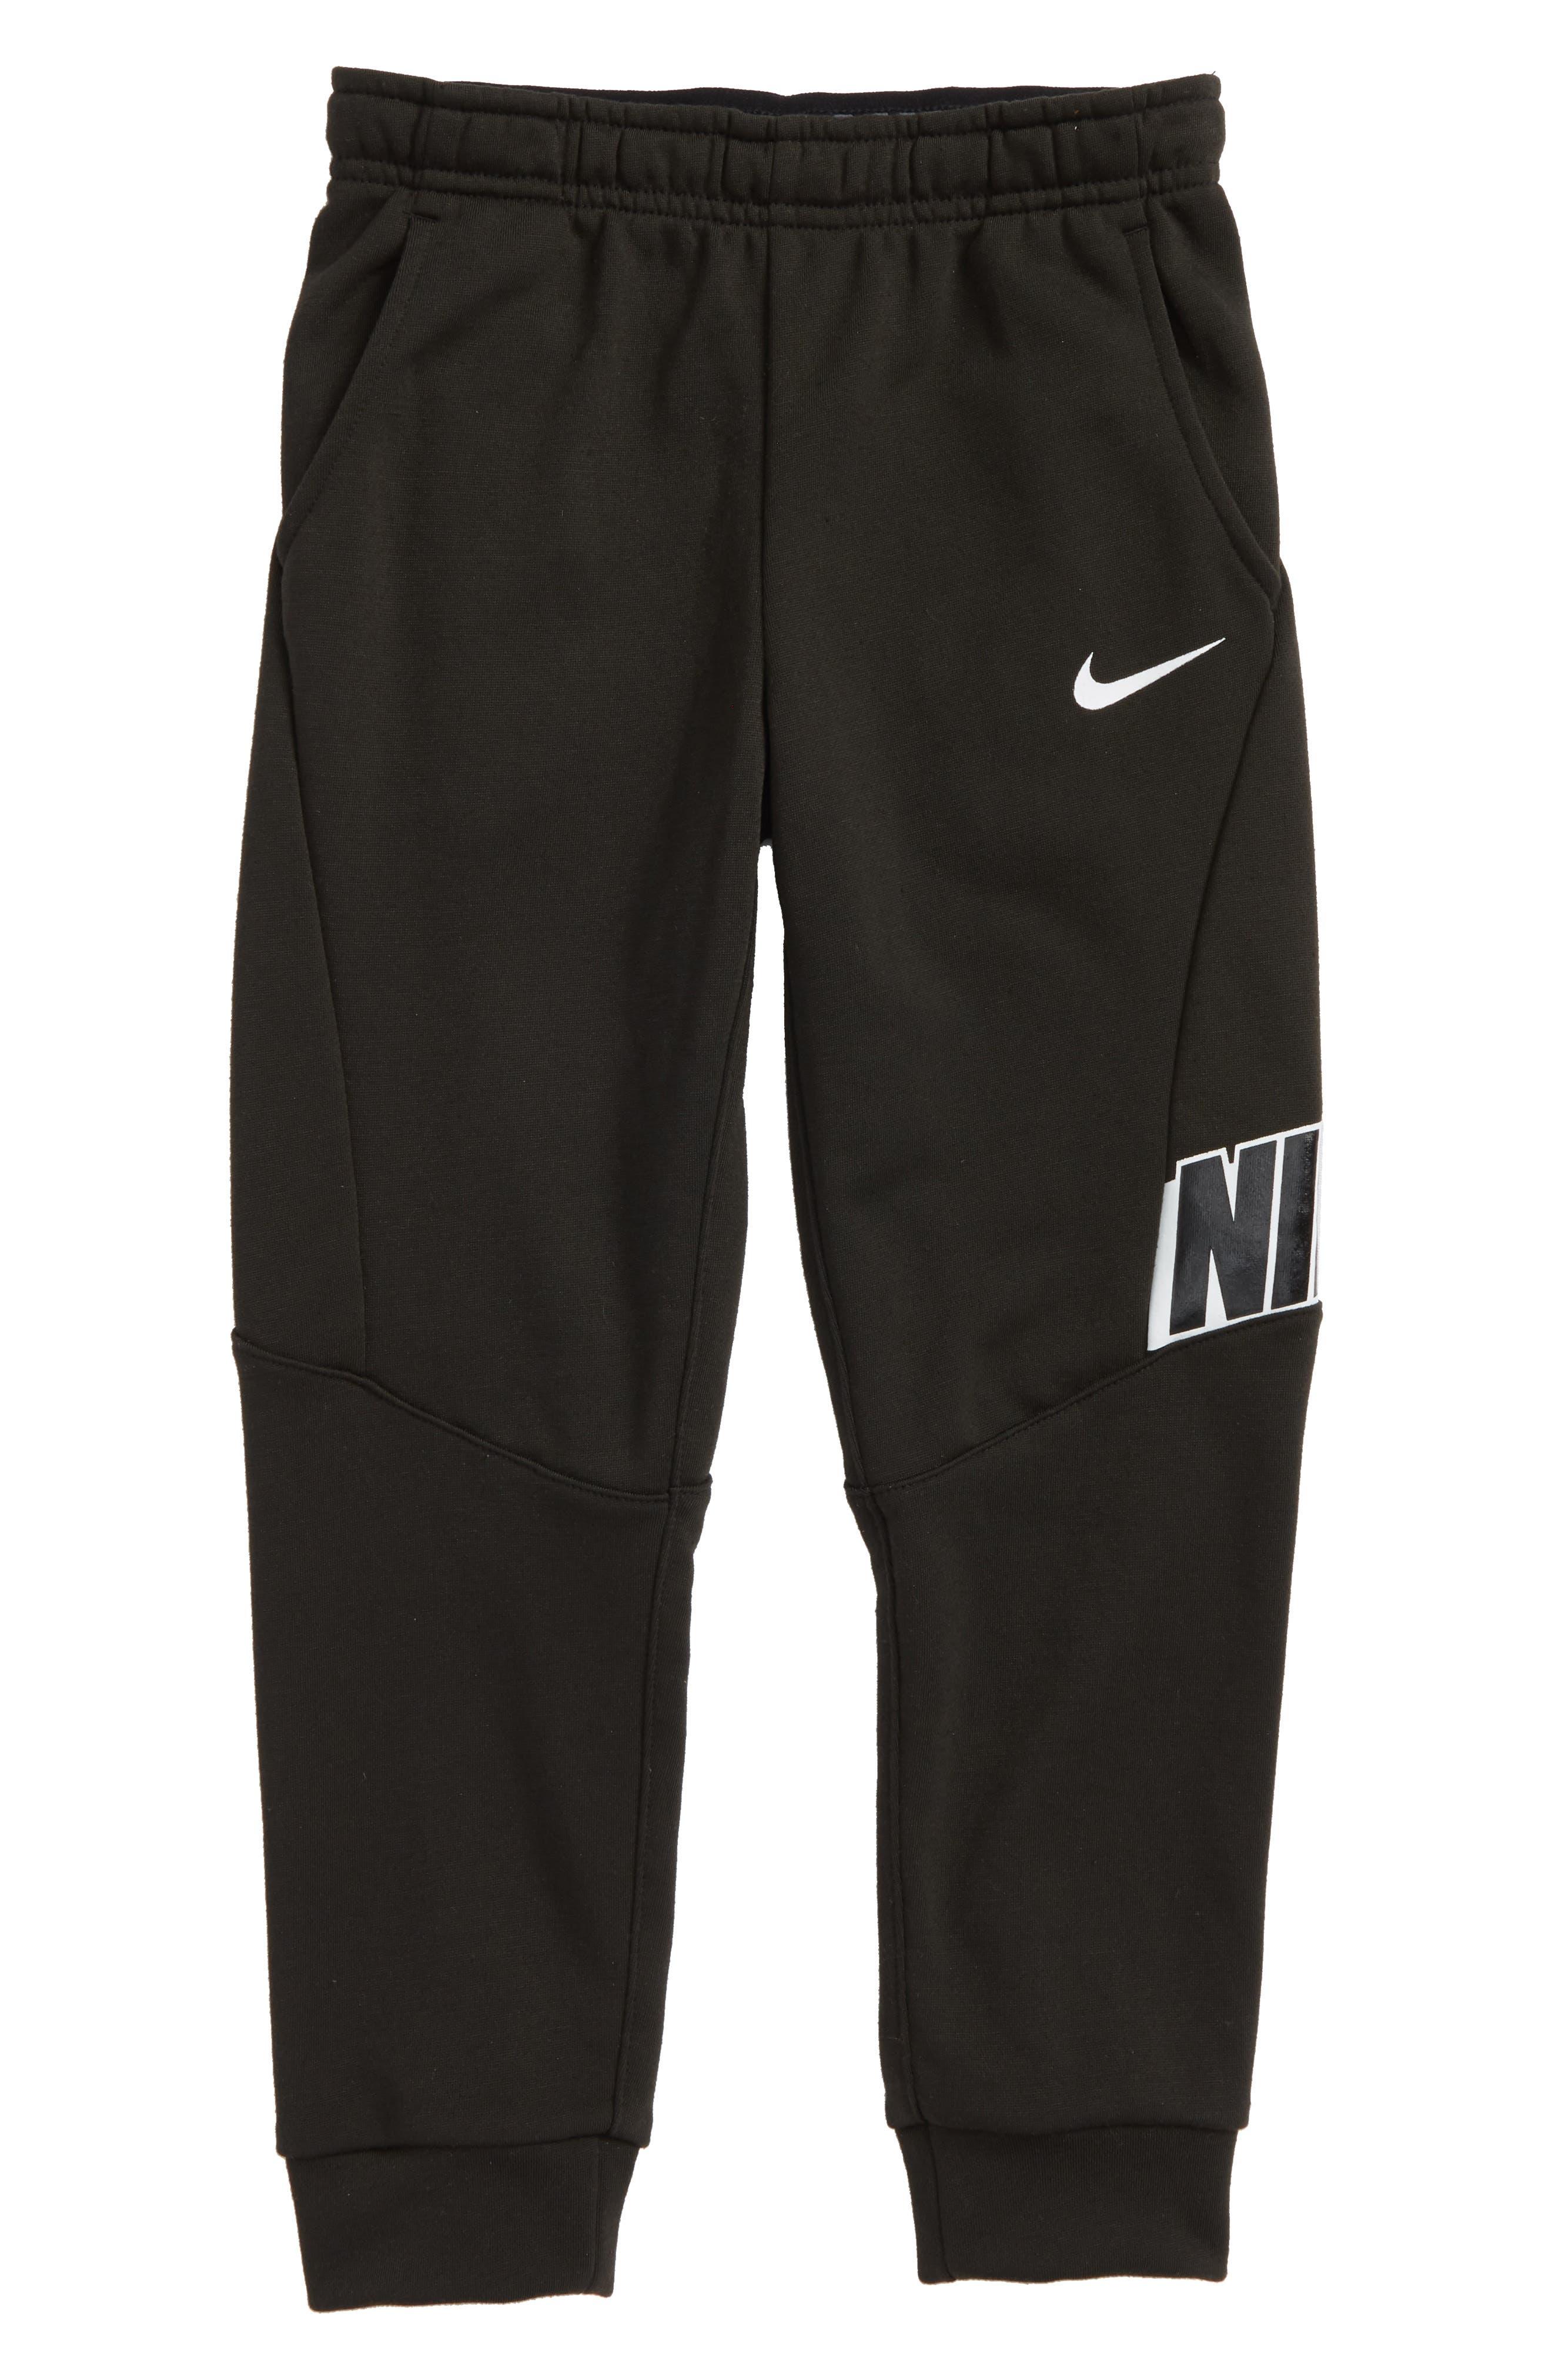 NIKE,                             Dry Sweatpants,                             Main thumbnail 1, color,                             008